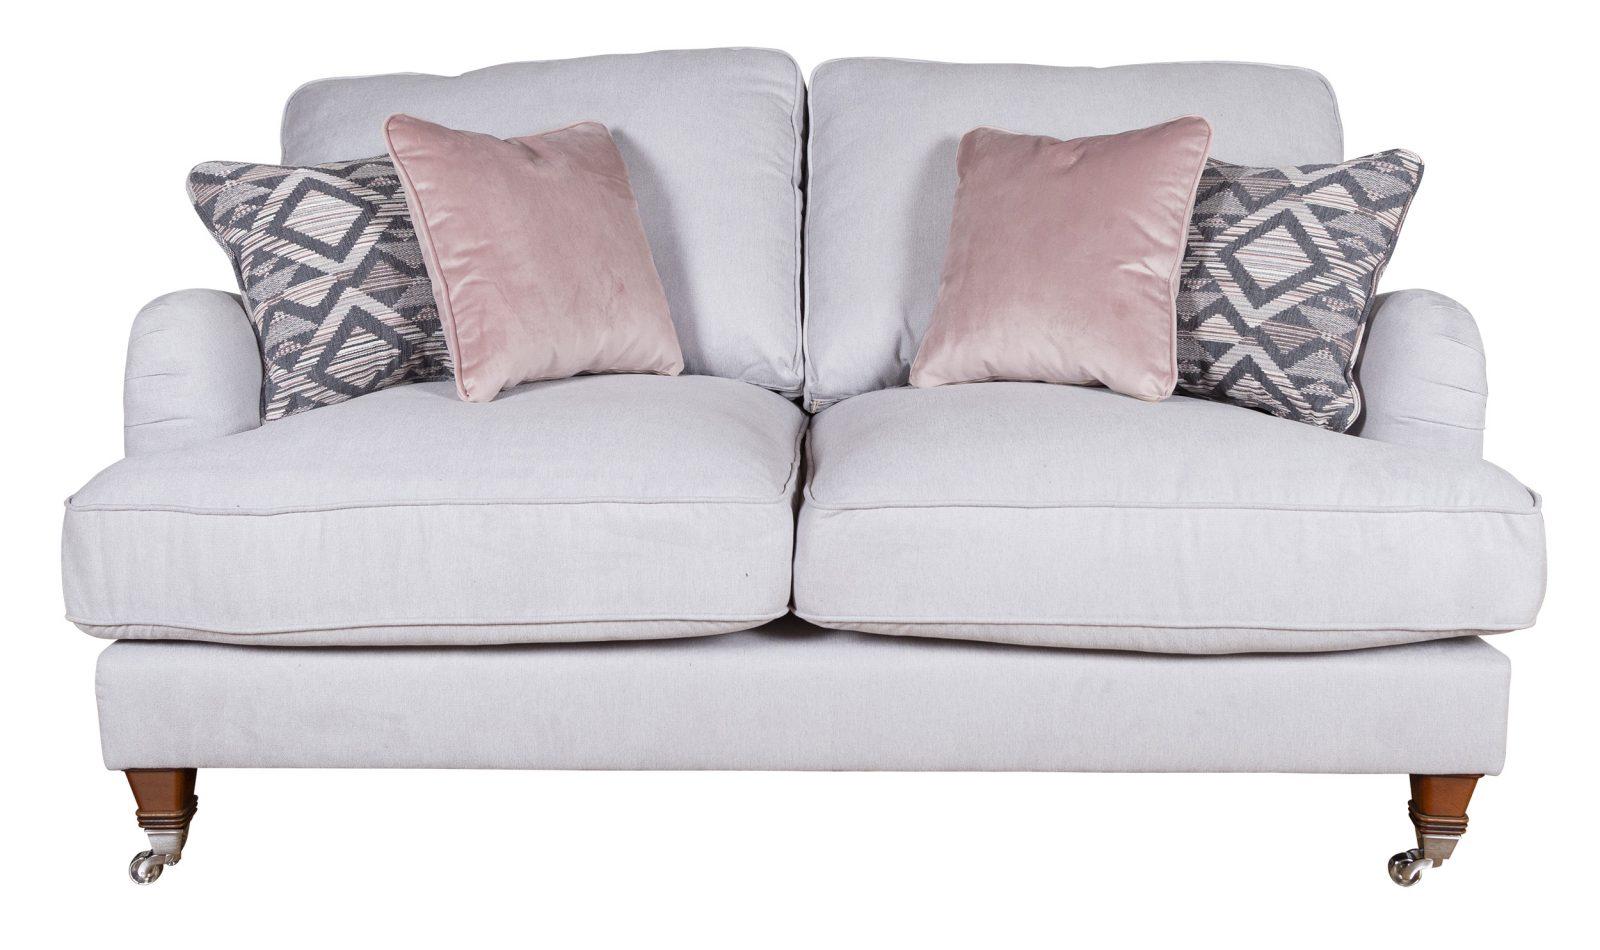 Beatrix 2 Seater Sofa